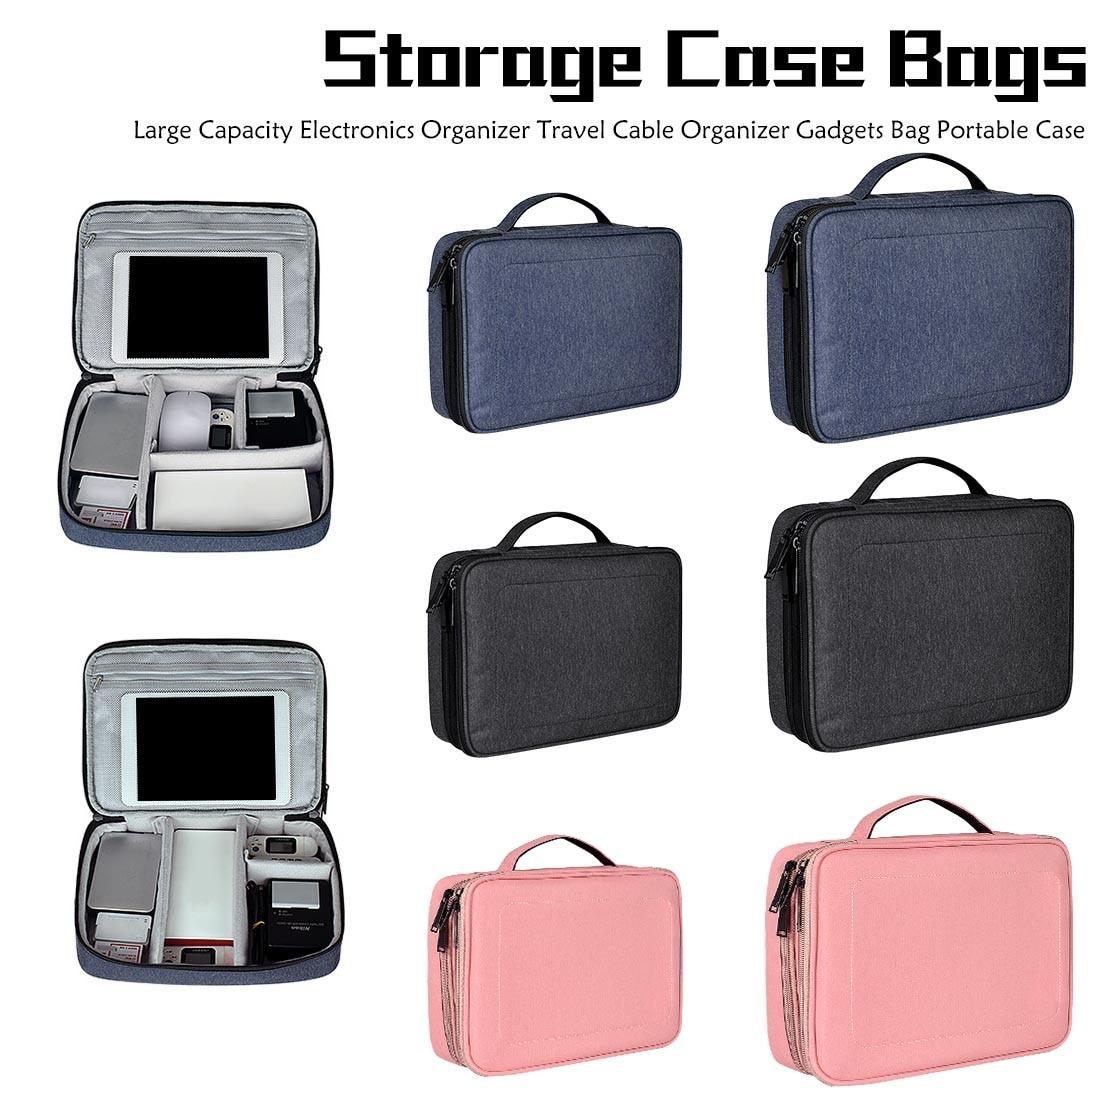 Storage Bag Travel Cable Organizer